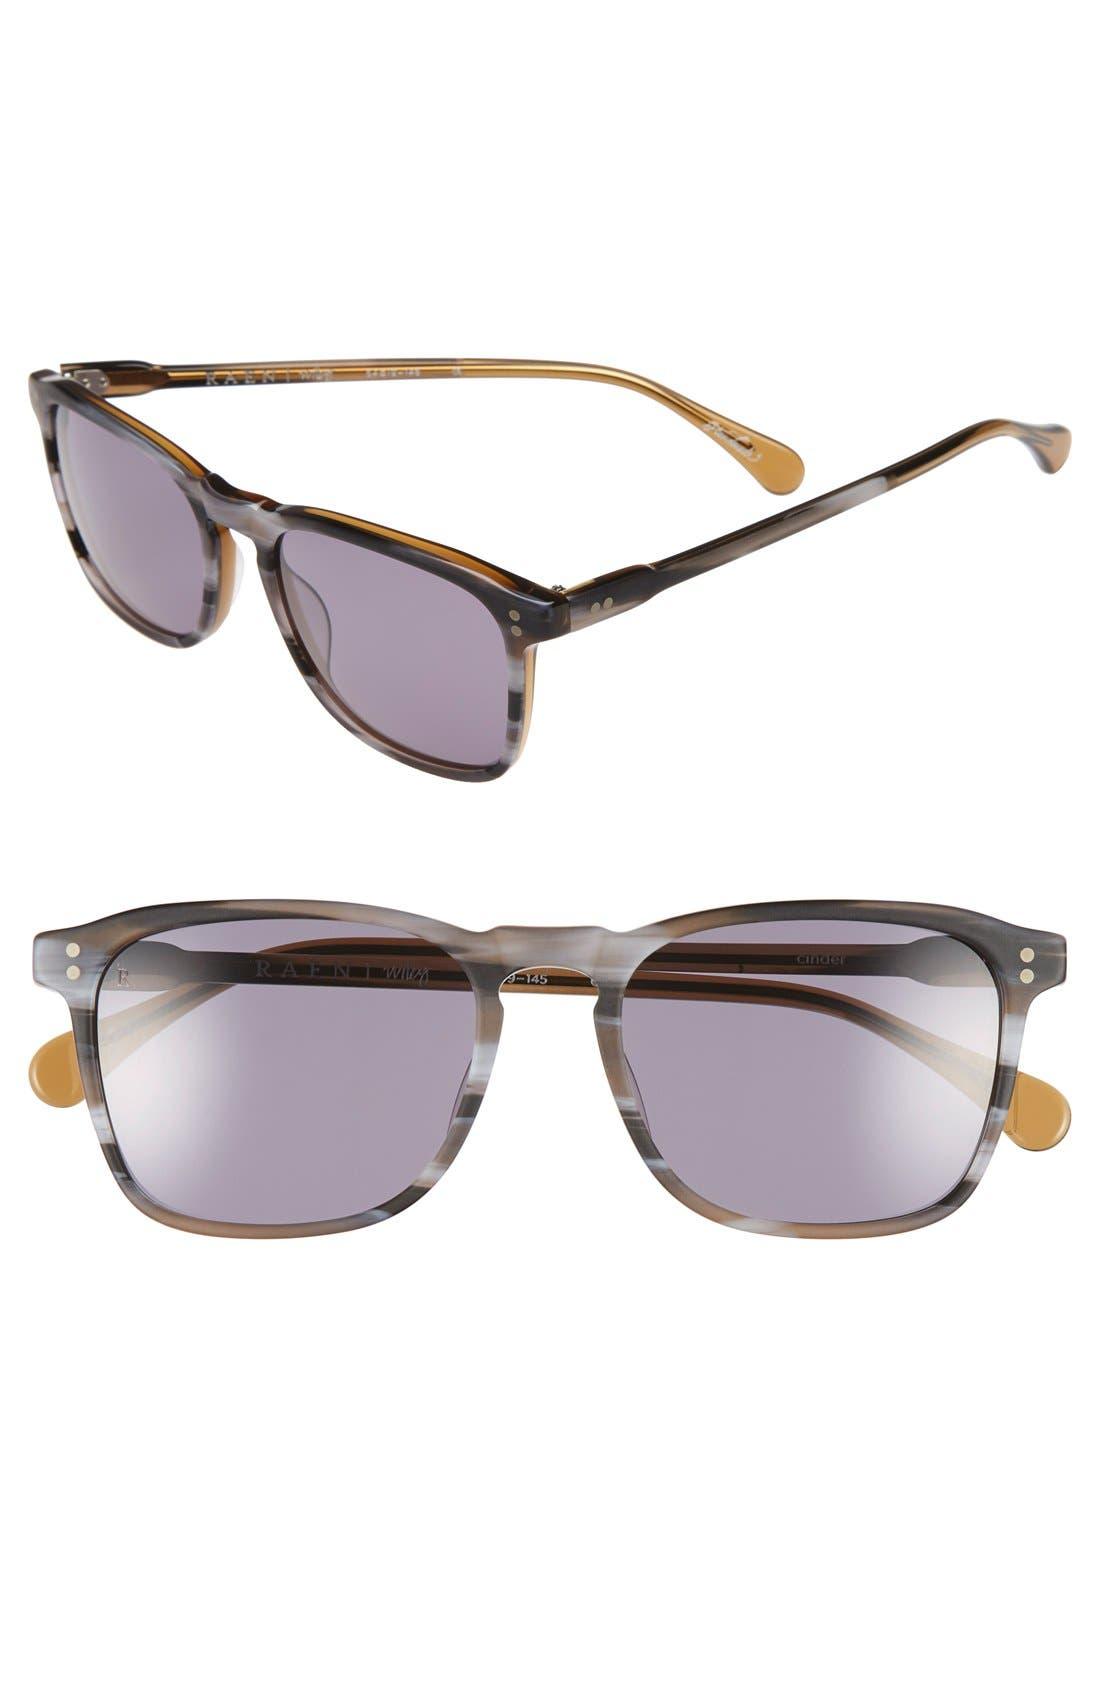 Main Image - RAEN 'Wiley' 54mm Sunglasses